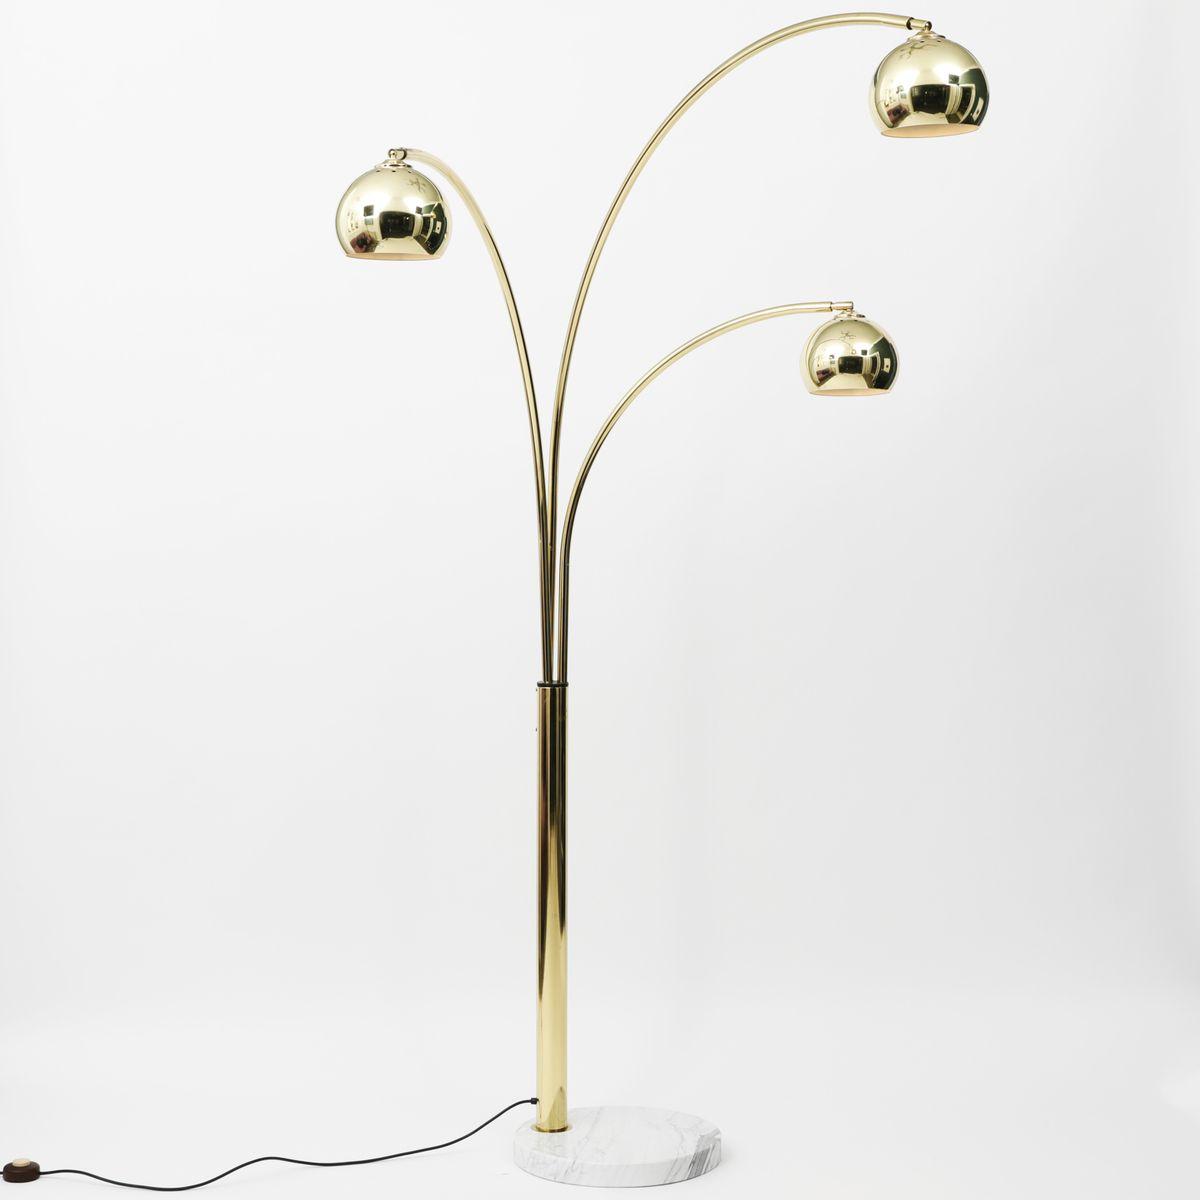 Brass Arc Lamp With Marble Base, Goffredo Reggiani, 1960u0027s